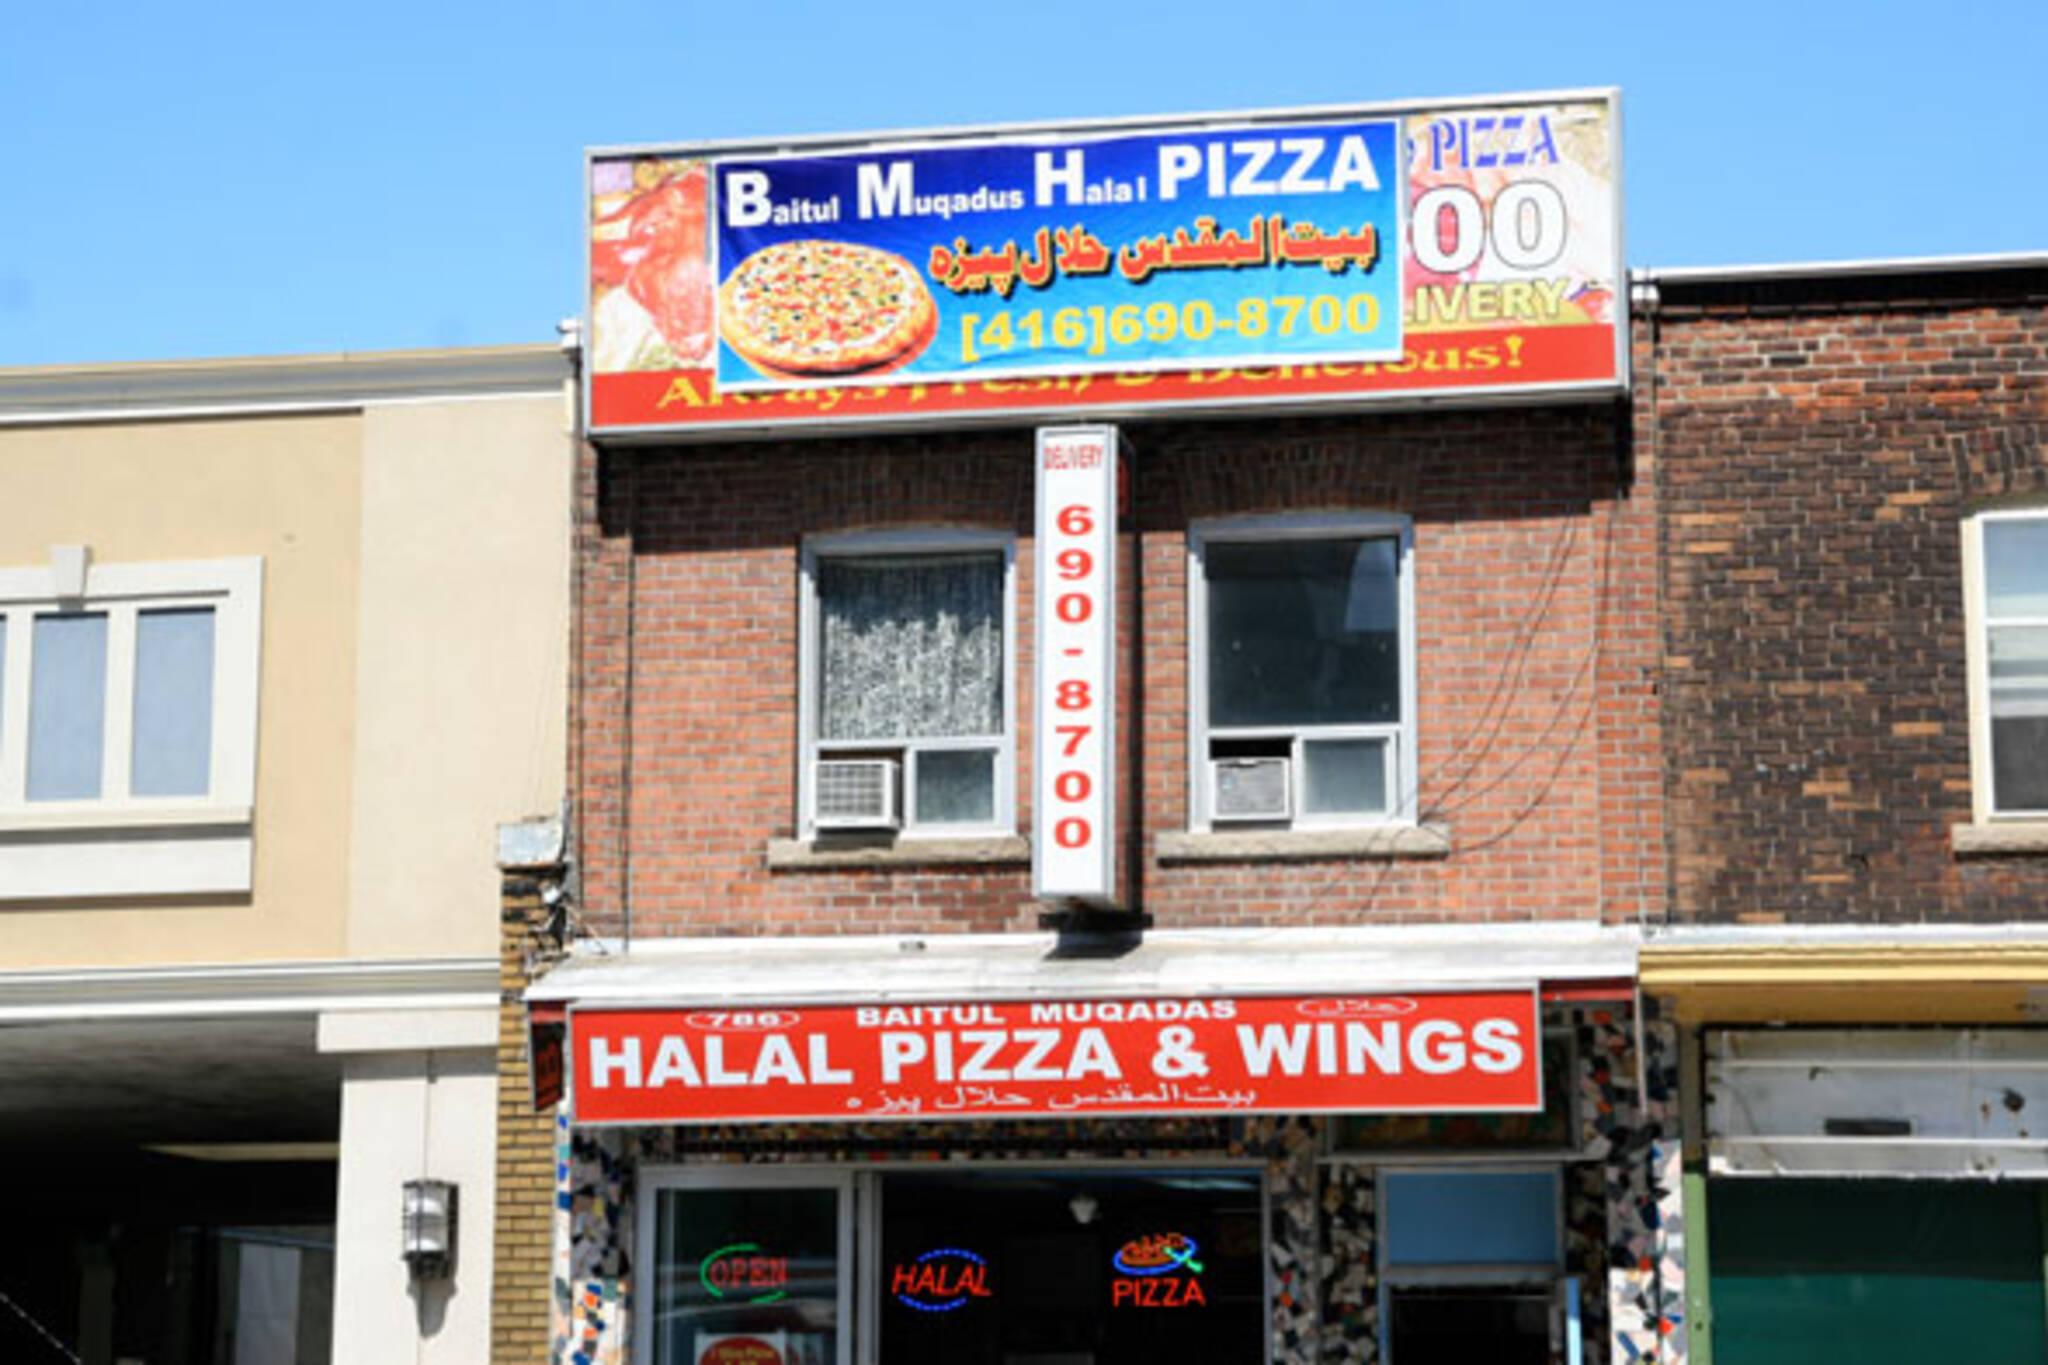 Baitul Muqadus Halal Pizza & Wings Toronto